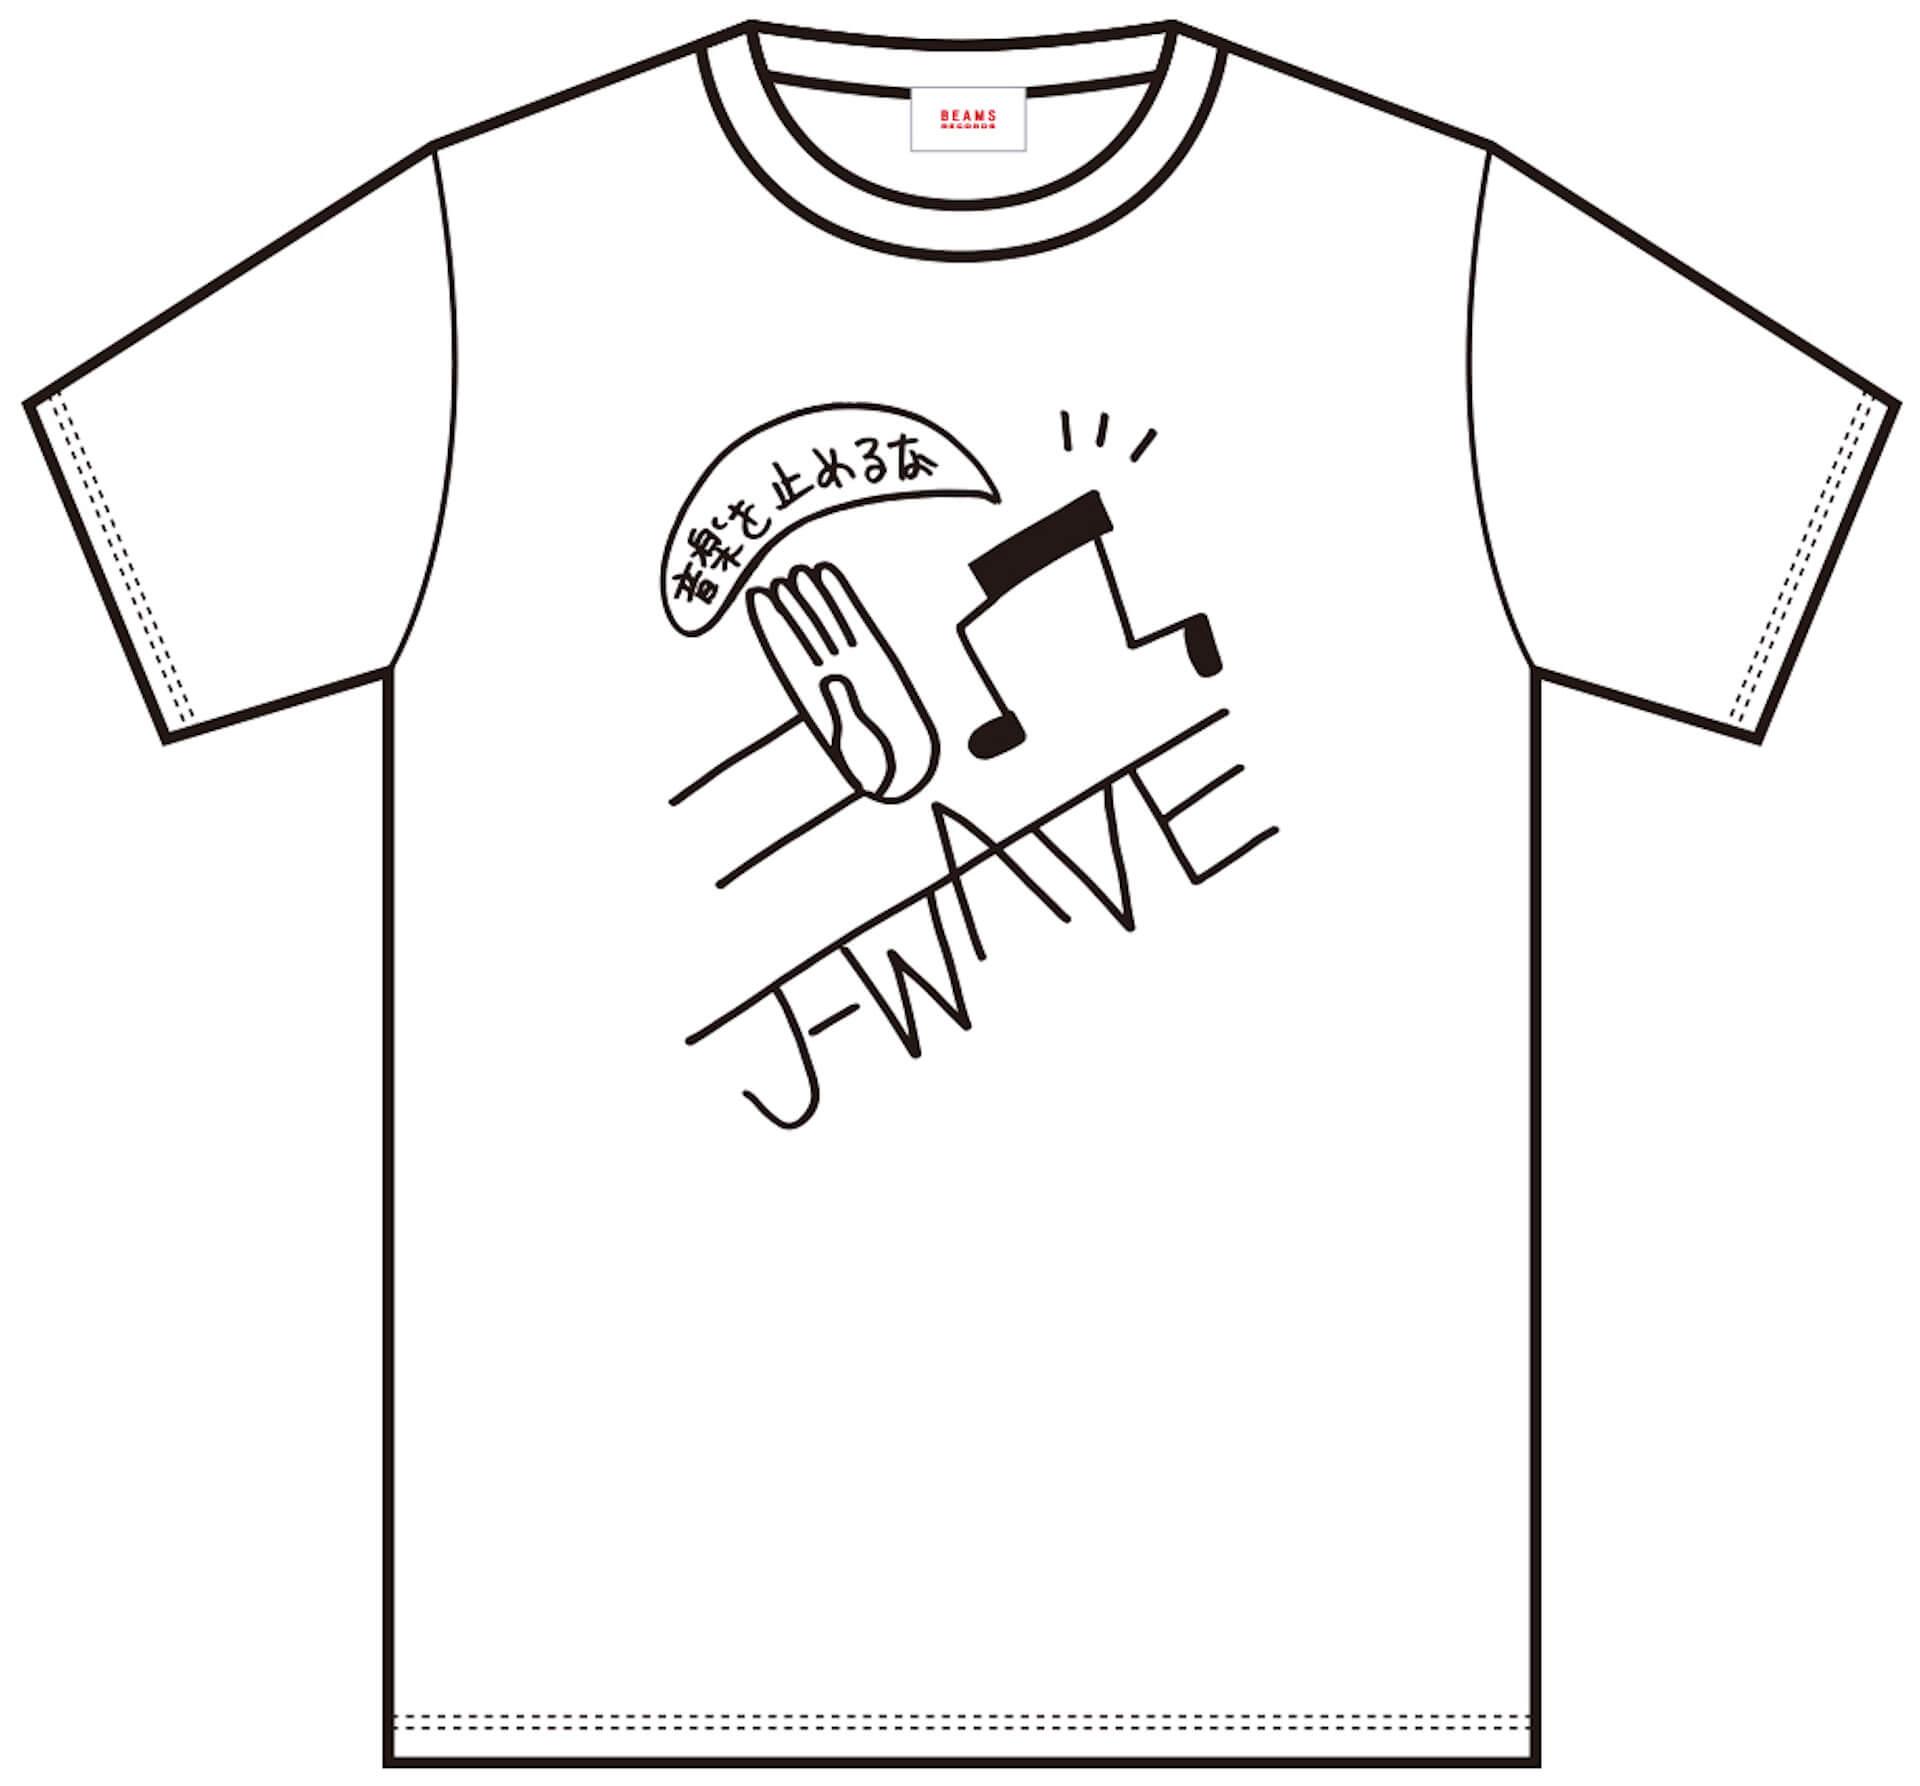 J-WAVE「#音楽を止めるな」BEAMS RECORDS協力のもと、ライブハウスを支援するオリジナルTシャツが受注販売開始! lf200515_jwave_beamsrecords_tshirts_09